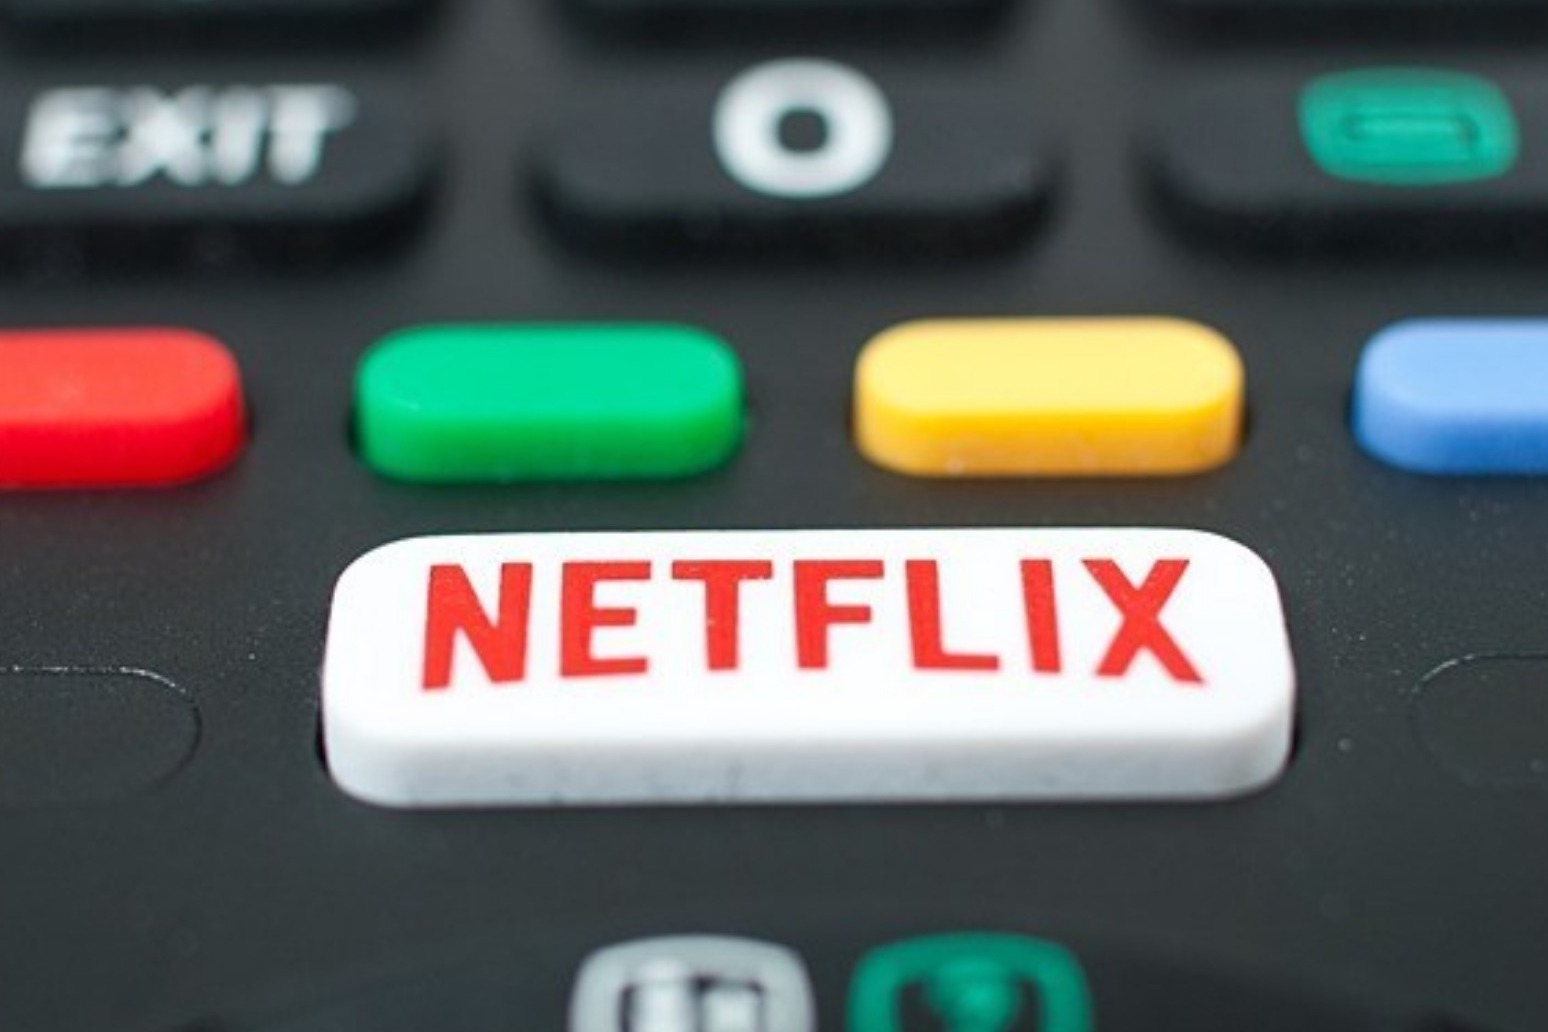 Netflix announces release date for Leonardo DiCaprio film Don't Look Up